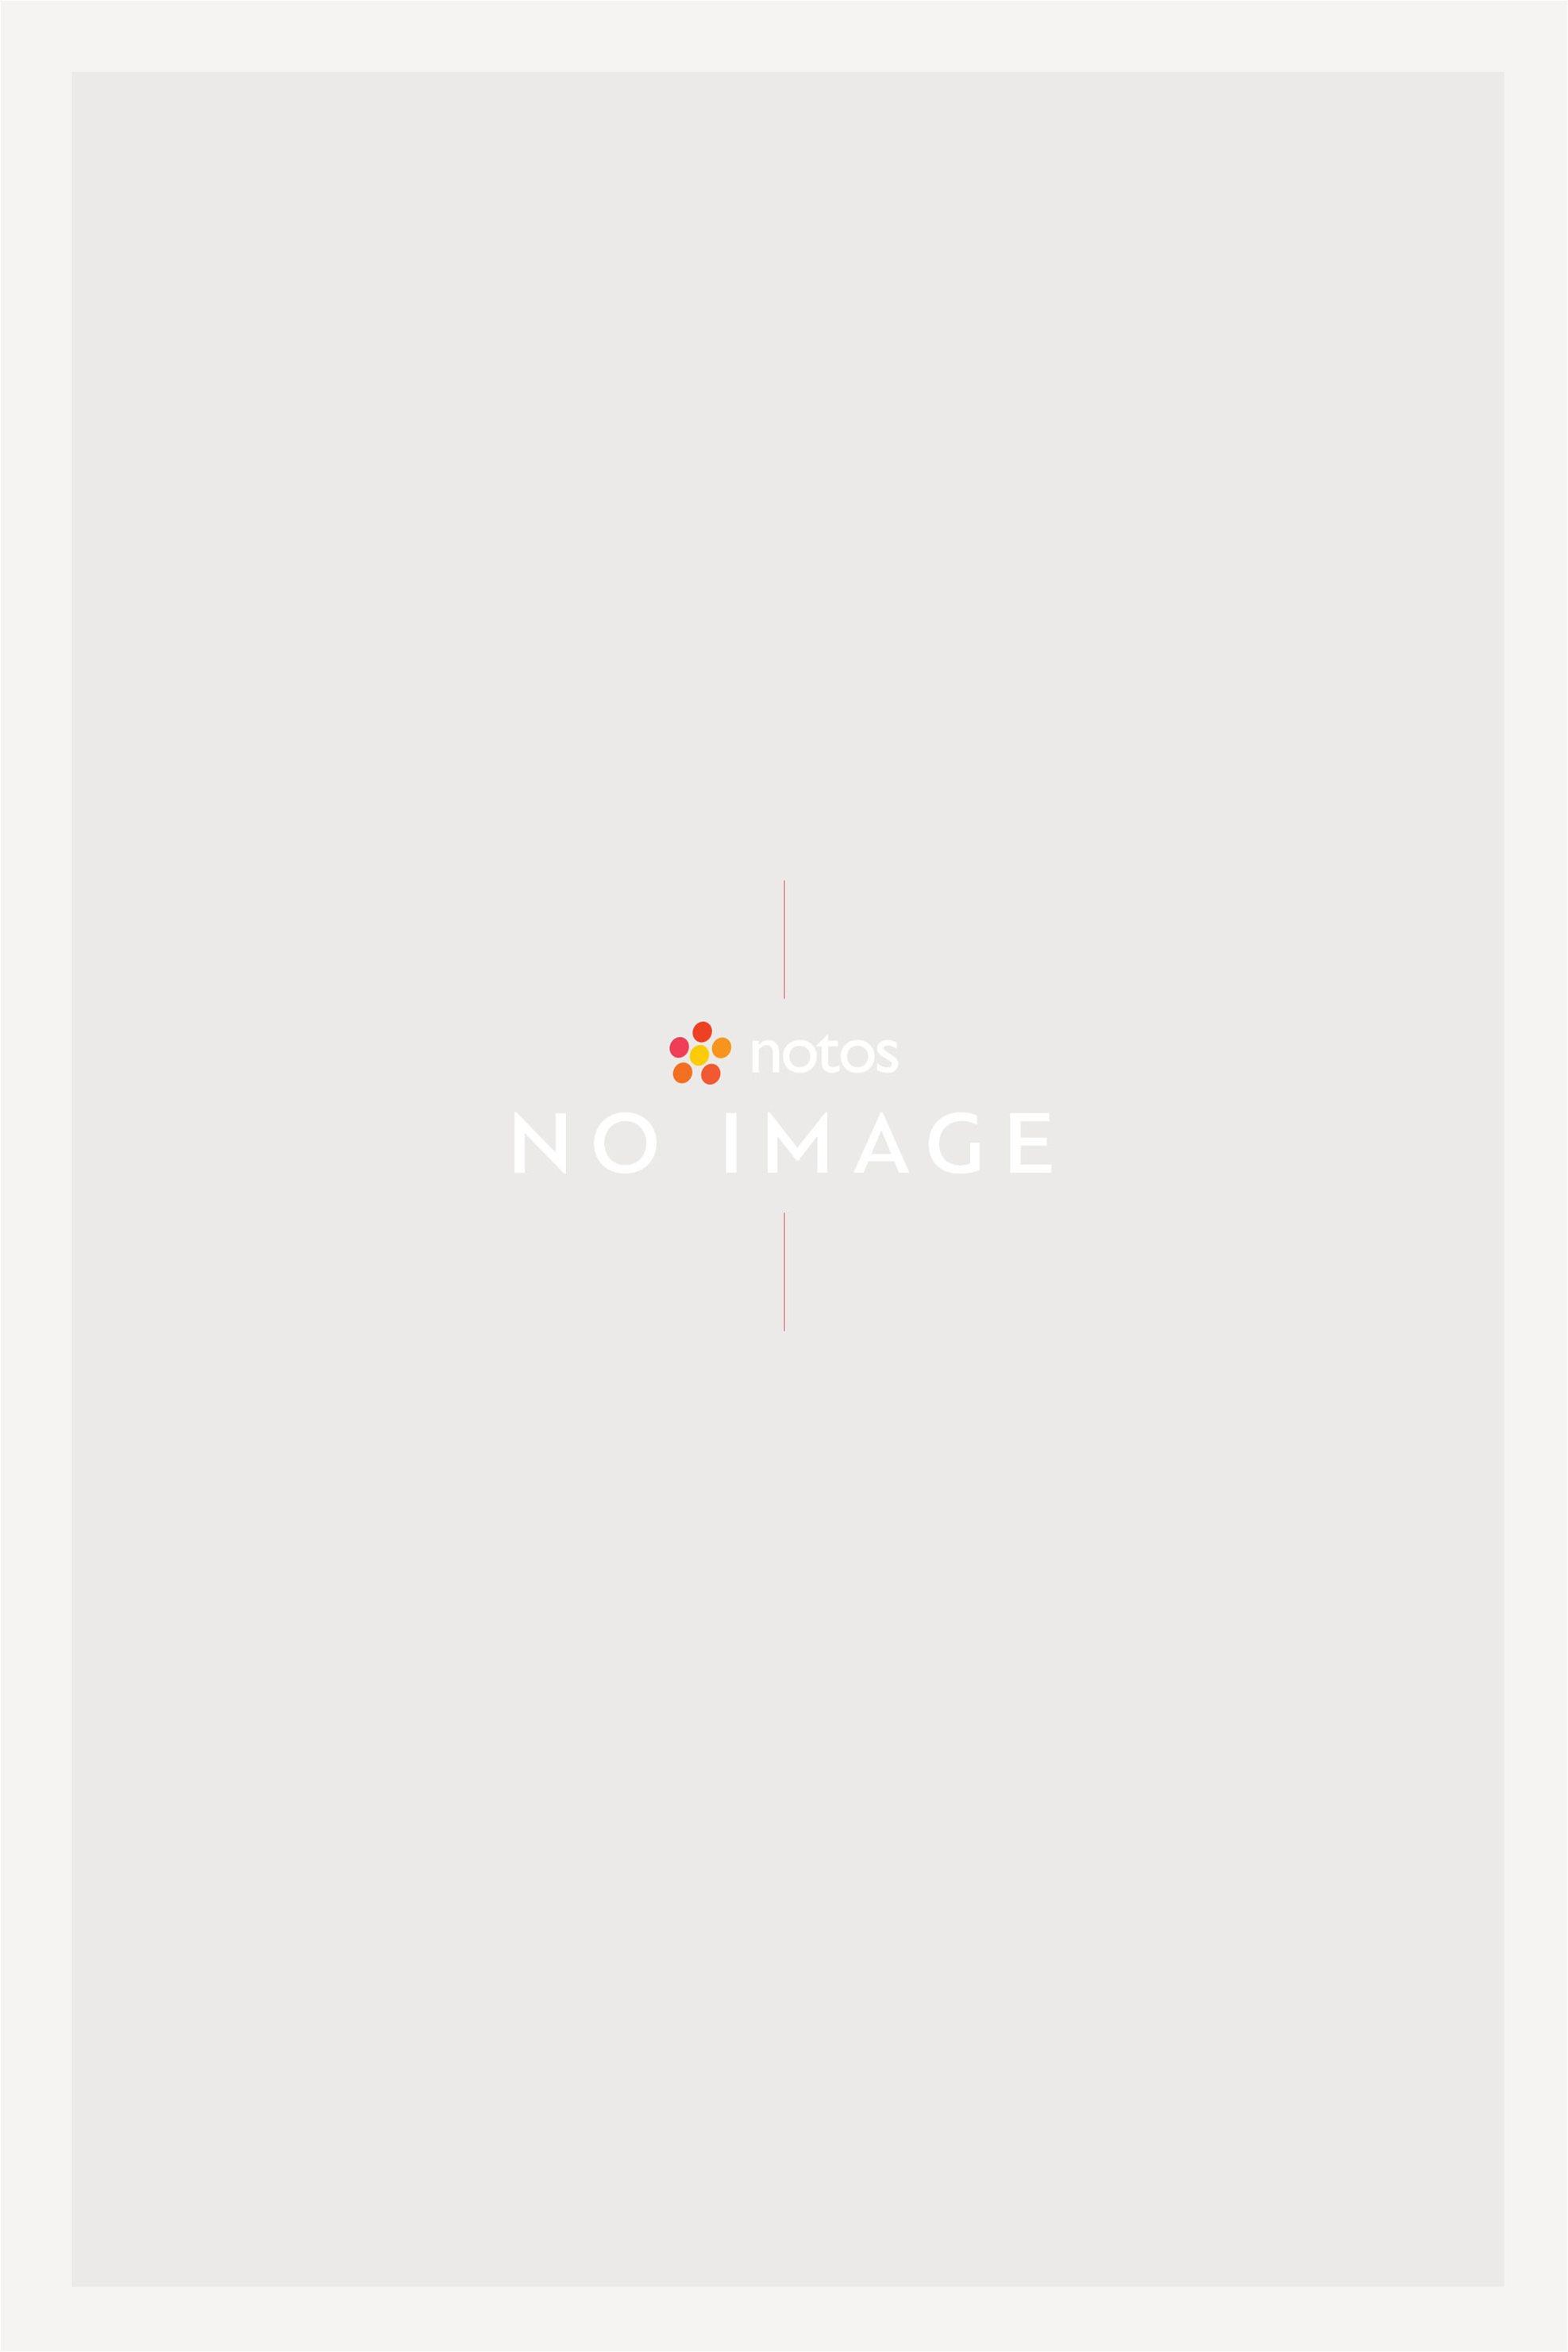 c03e2d11e4be Notos Nautica ανδρικό πουκάμισο Classic fit soft wash long sleeve button  down - W73000 - Λευκό